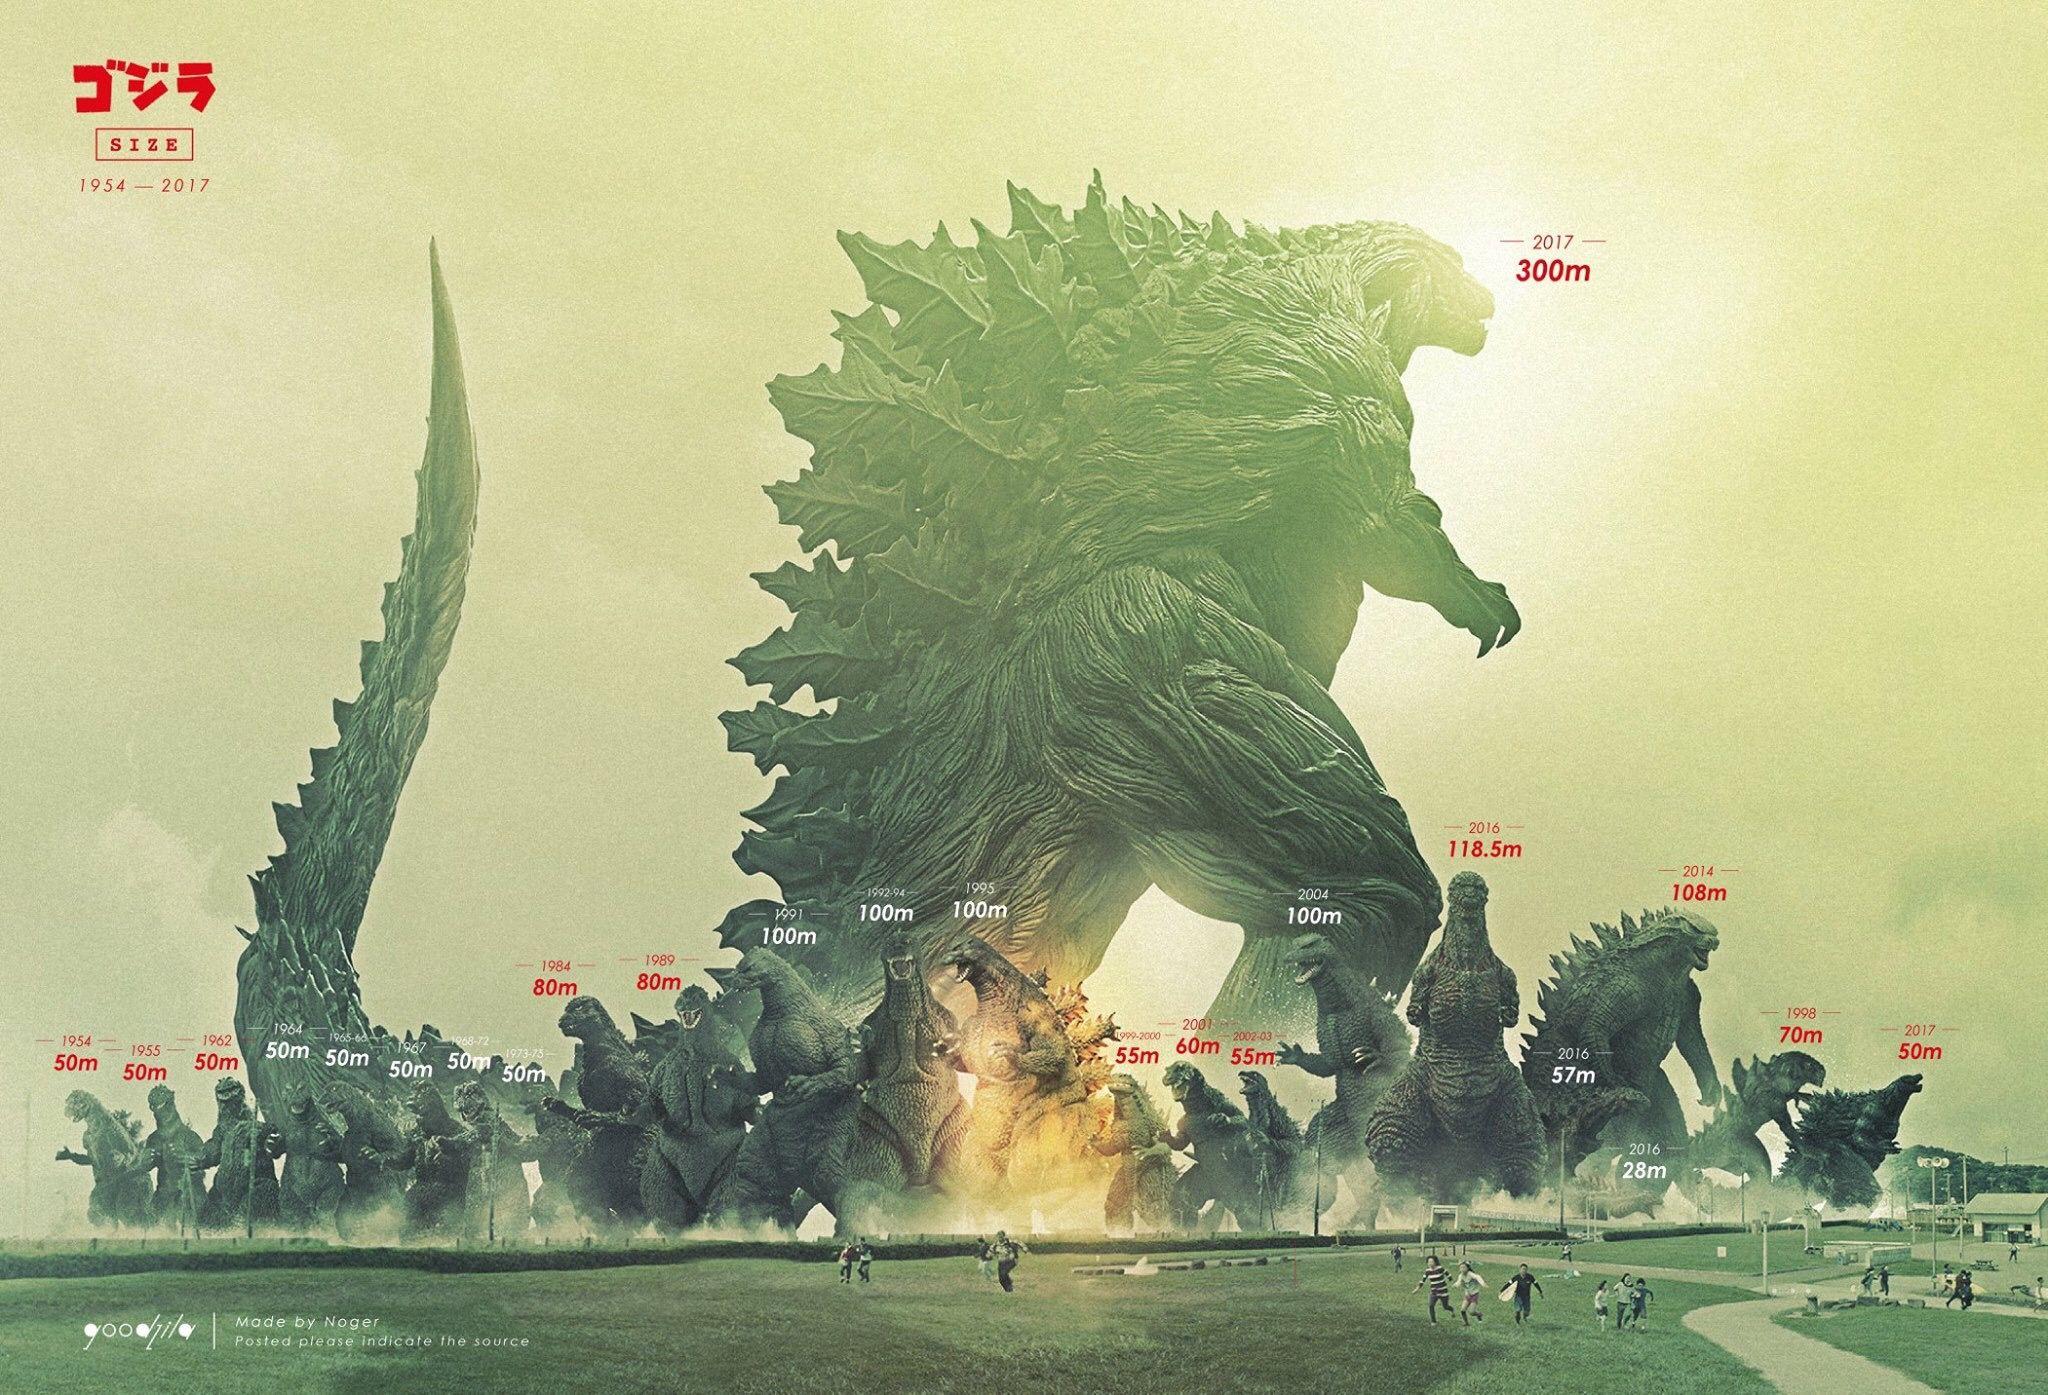 Godzilla-infographic.jpg (2048×1395)   Kaiju Korner   Pinterest ...